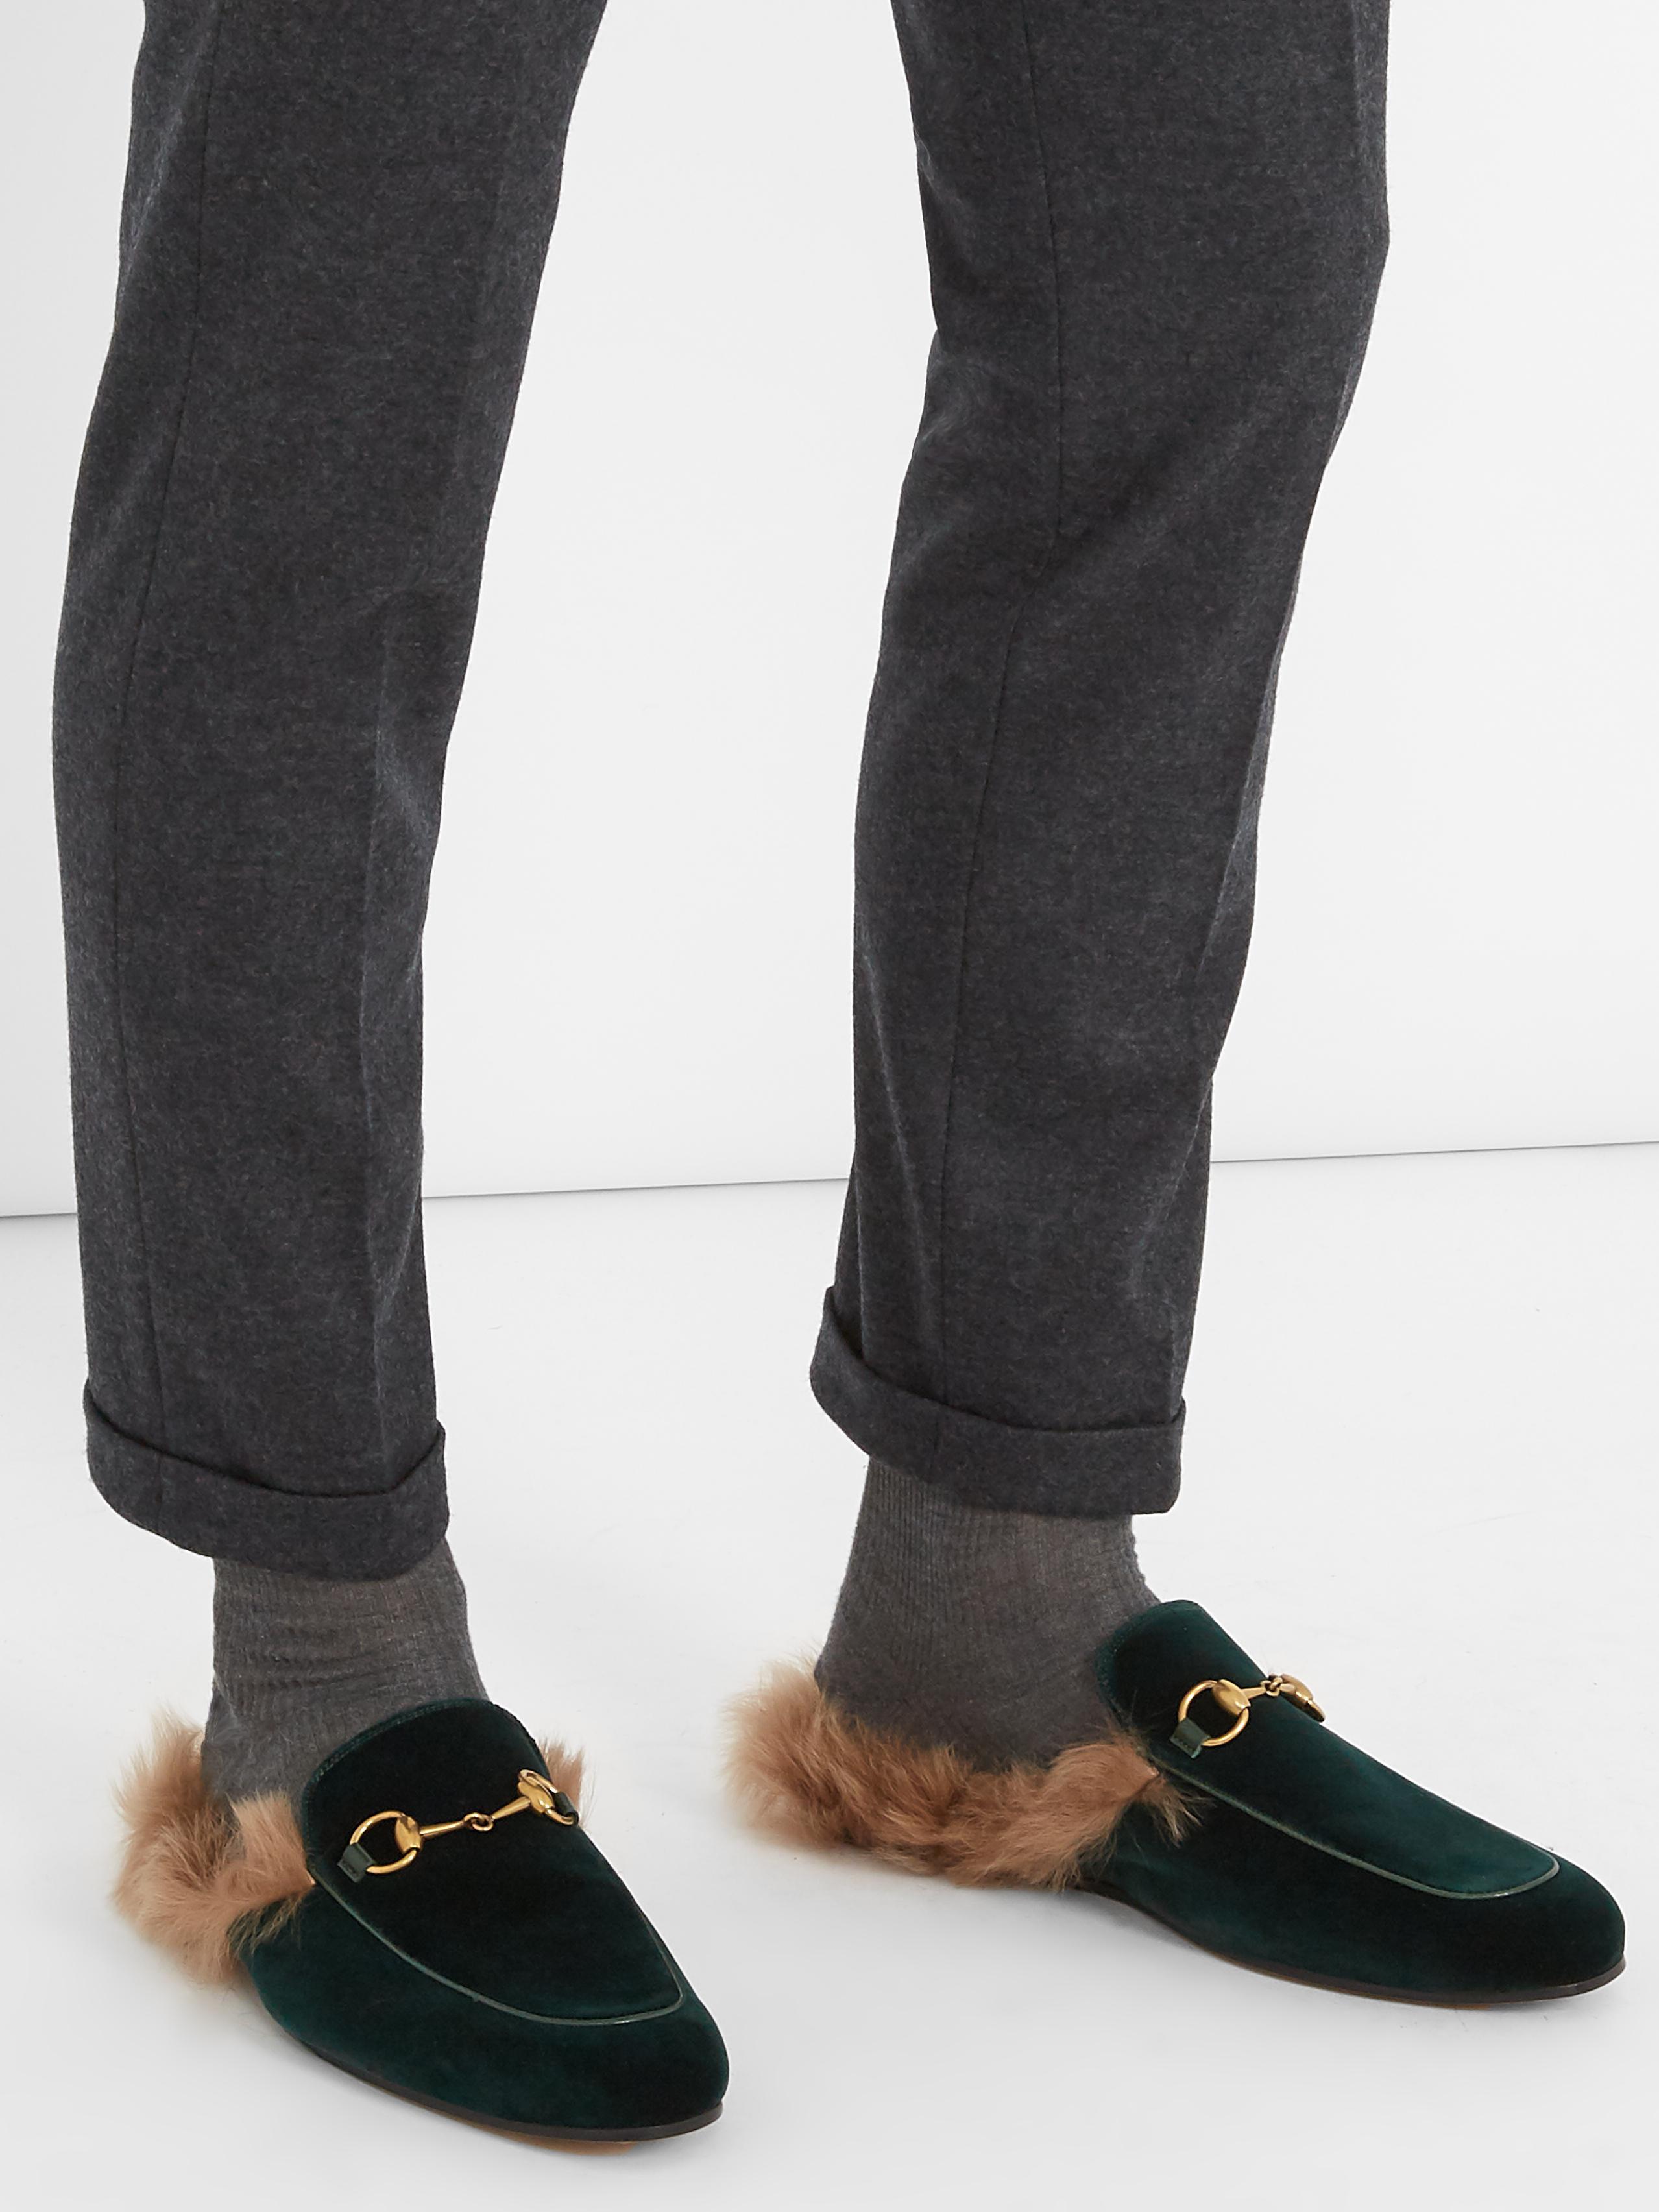 Gucci Princetown Fur-lined Velvet Loafers for Men - Lyst a7ec2d858